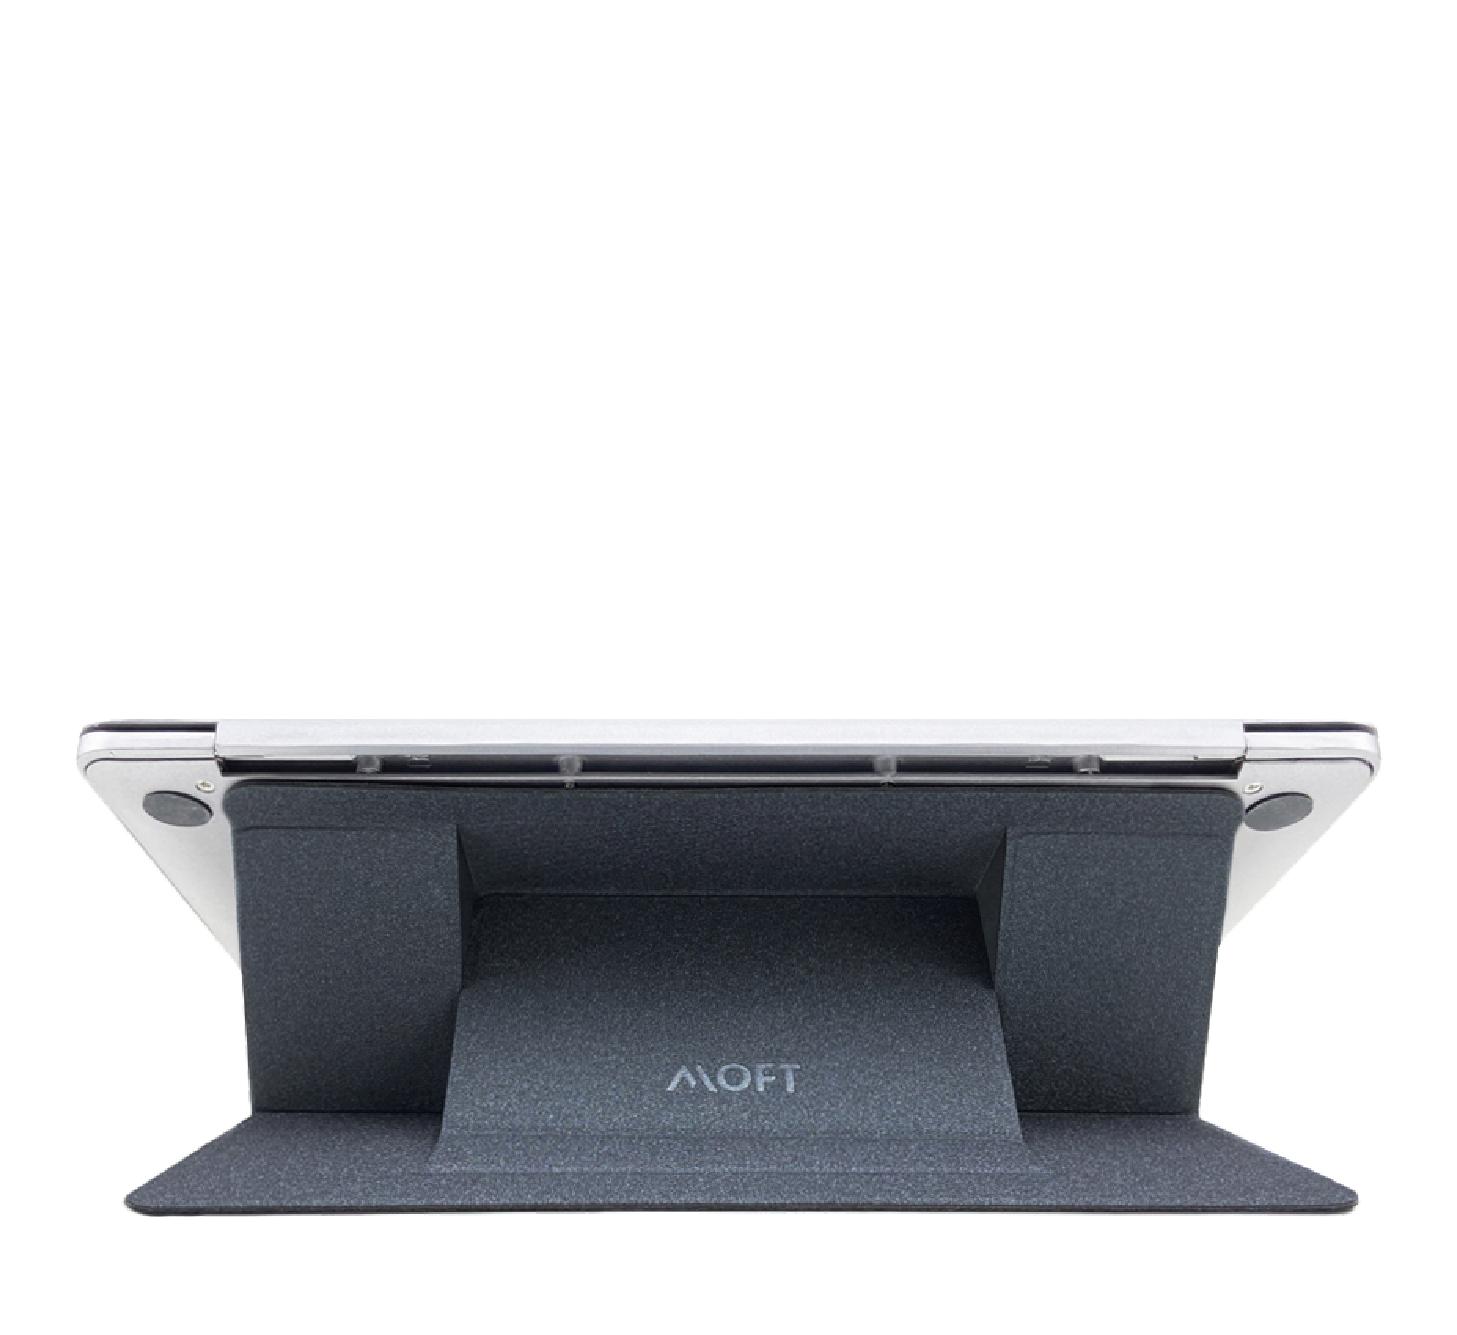 Moft | Mac Promotion